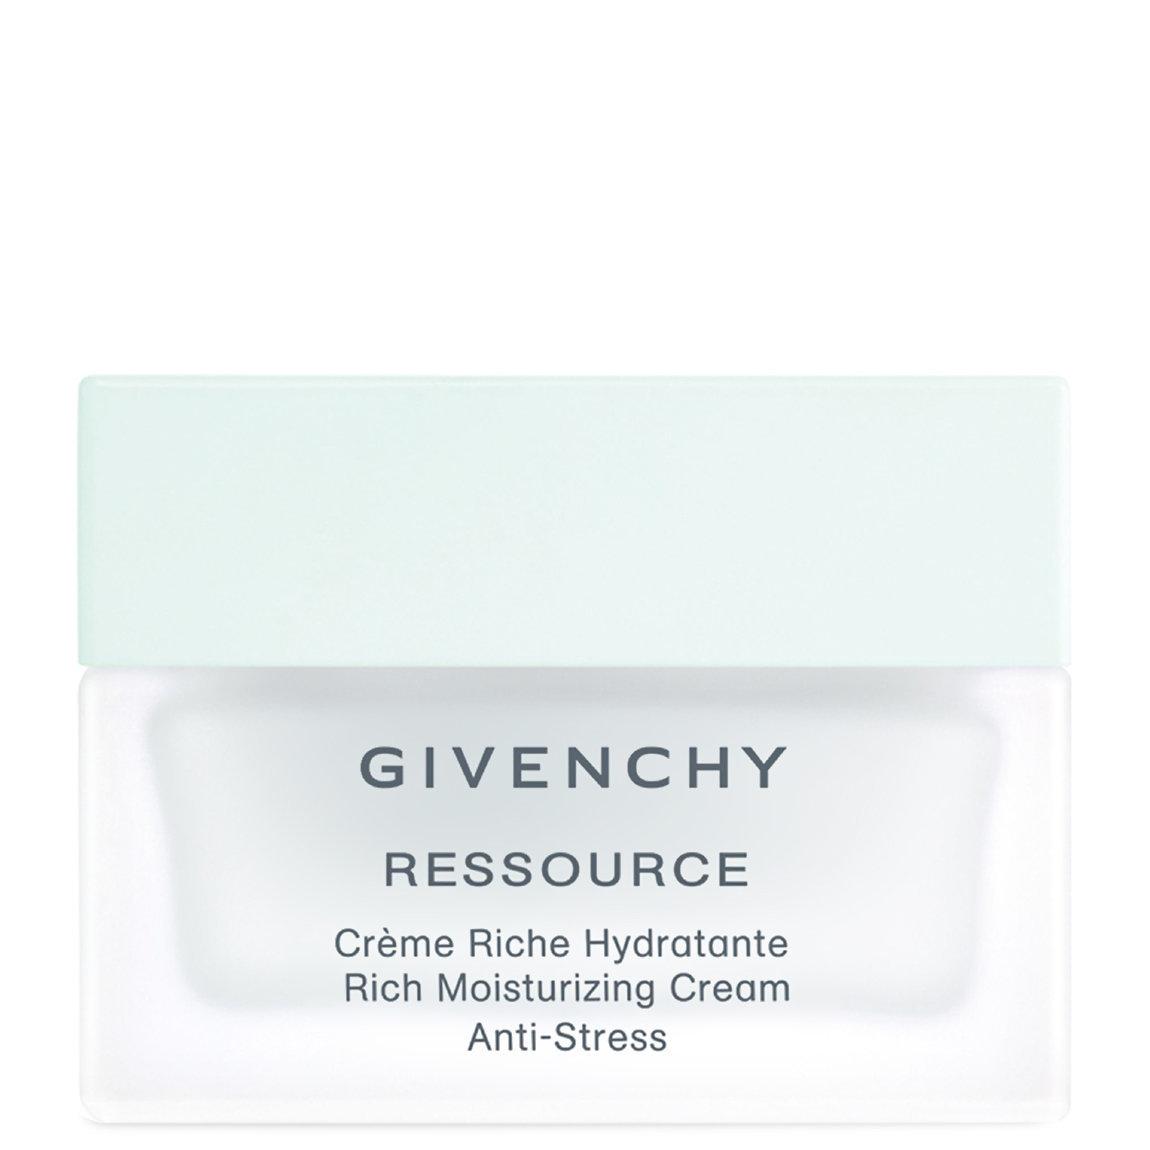 Givenchy Ressource Rich Moisturizing Cream Anti-Stress alternative view 1 - product swatch.